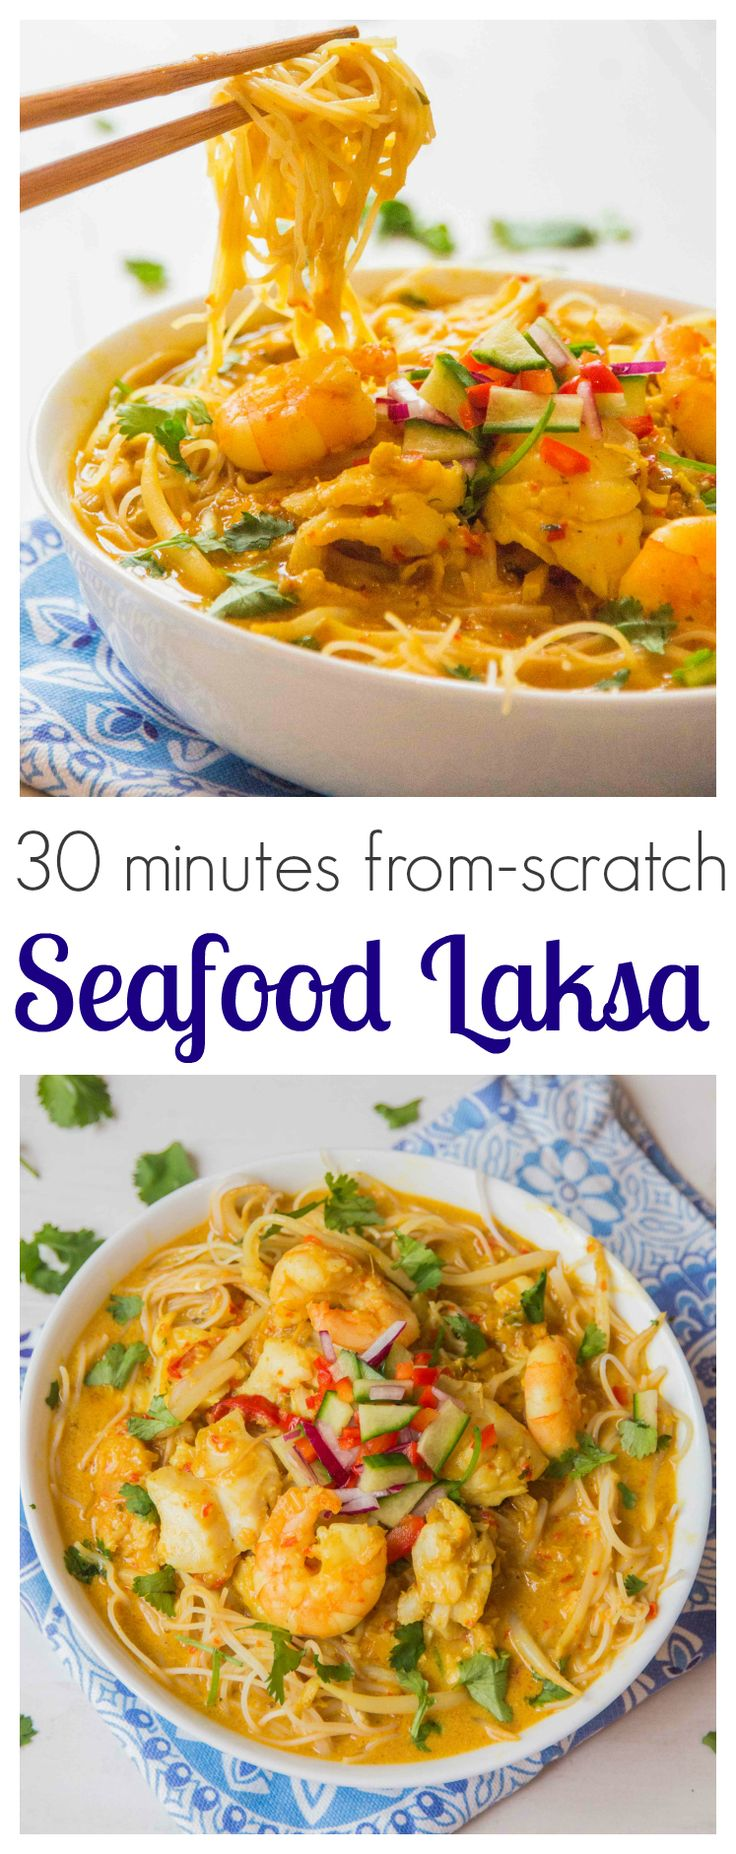 Seafood Laksa - Slurpy, spicy Thai noodle soup. Gluten Free!